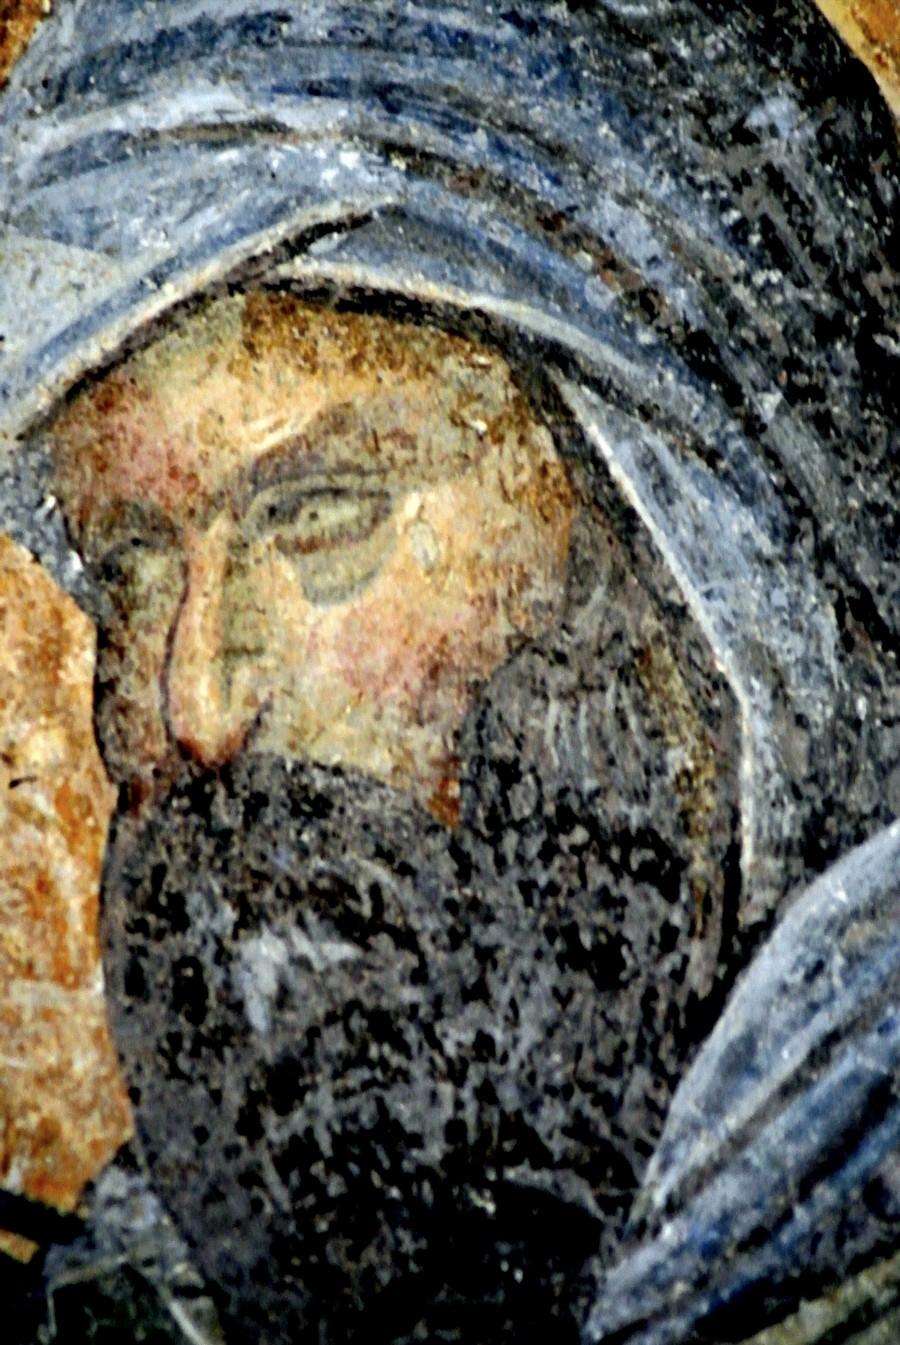 Святой Преподобный Косма, Епископ Маиумский, творец канонов. Фреска монастыря Хора в Константинополе. 1316 - 1321 годы. Фрагмент.